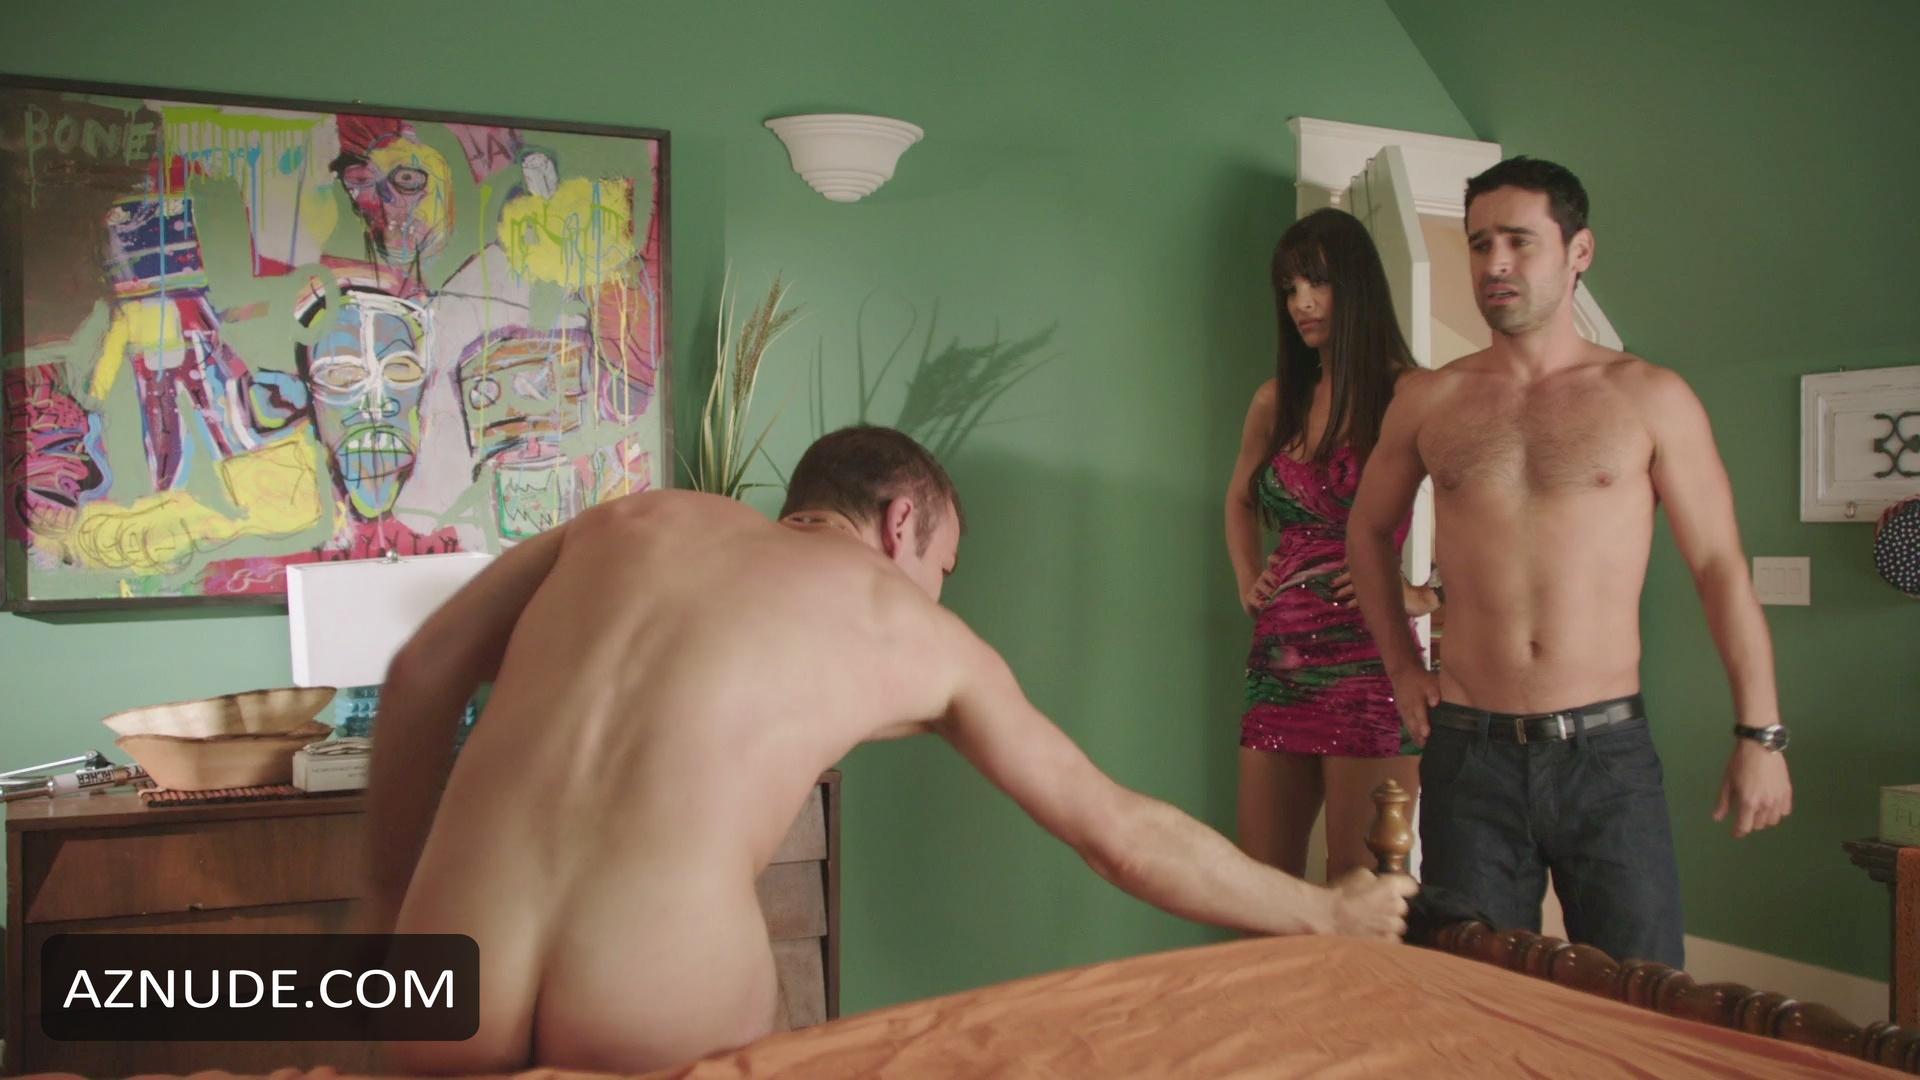 Jesse bradford nude fakes 3